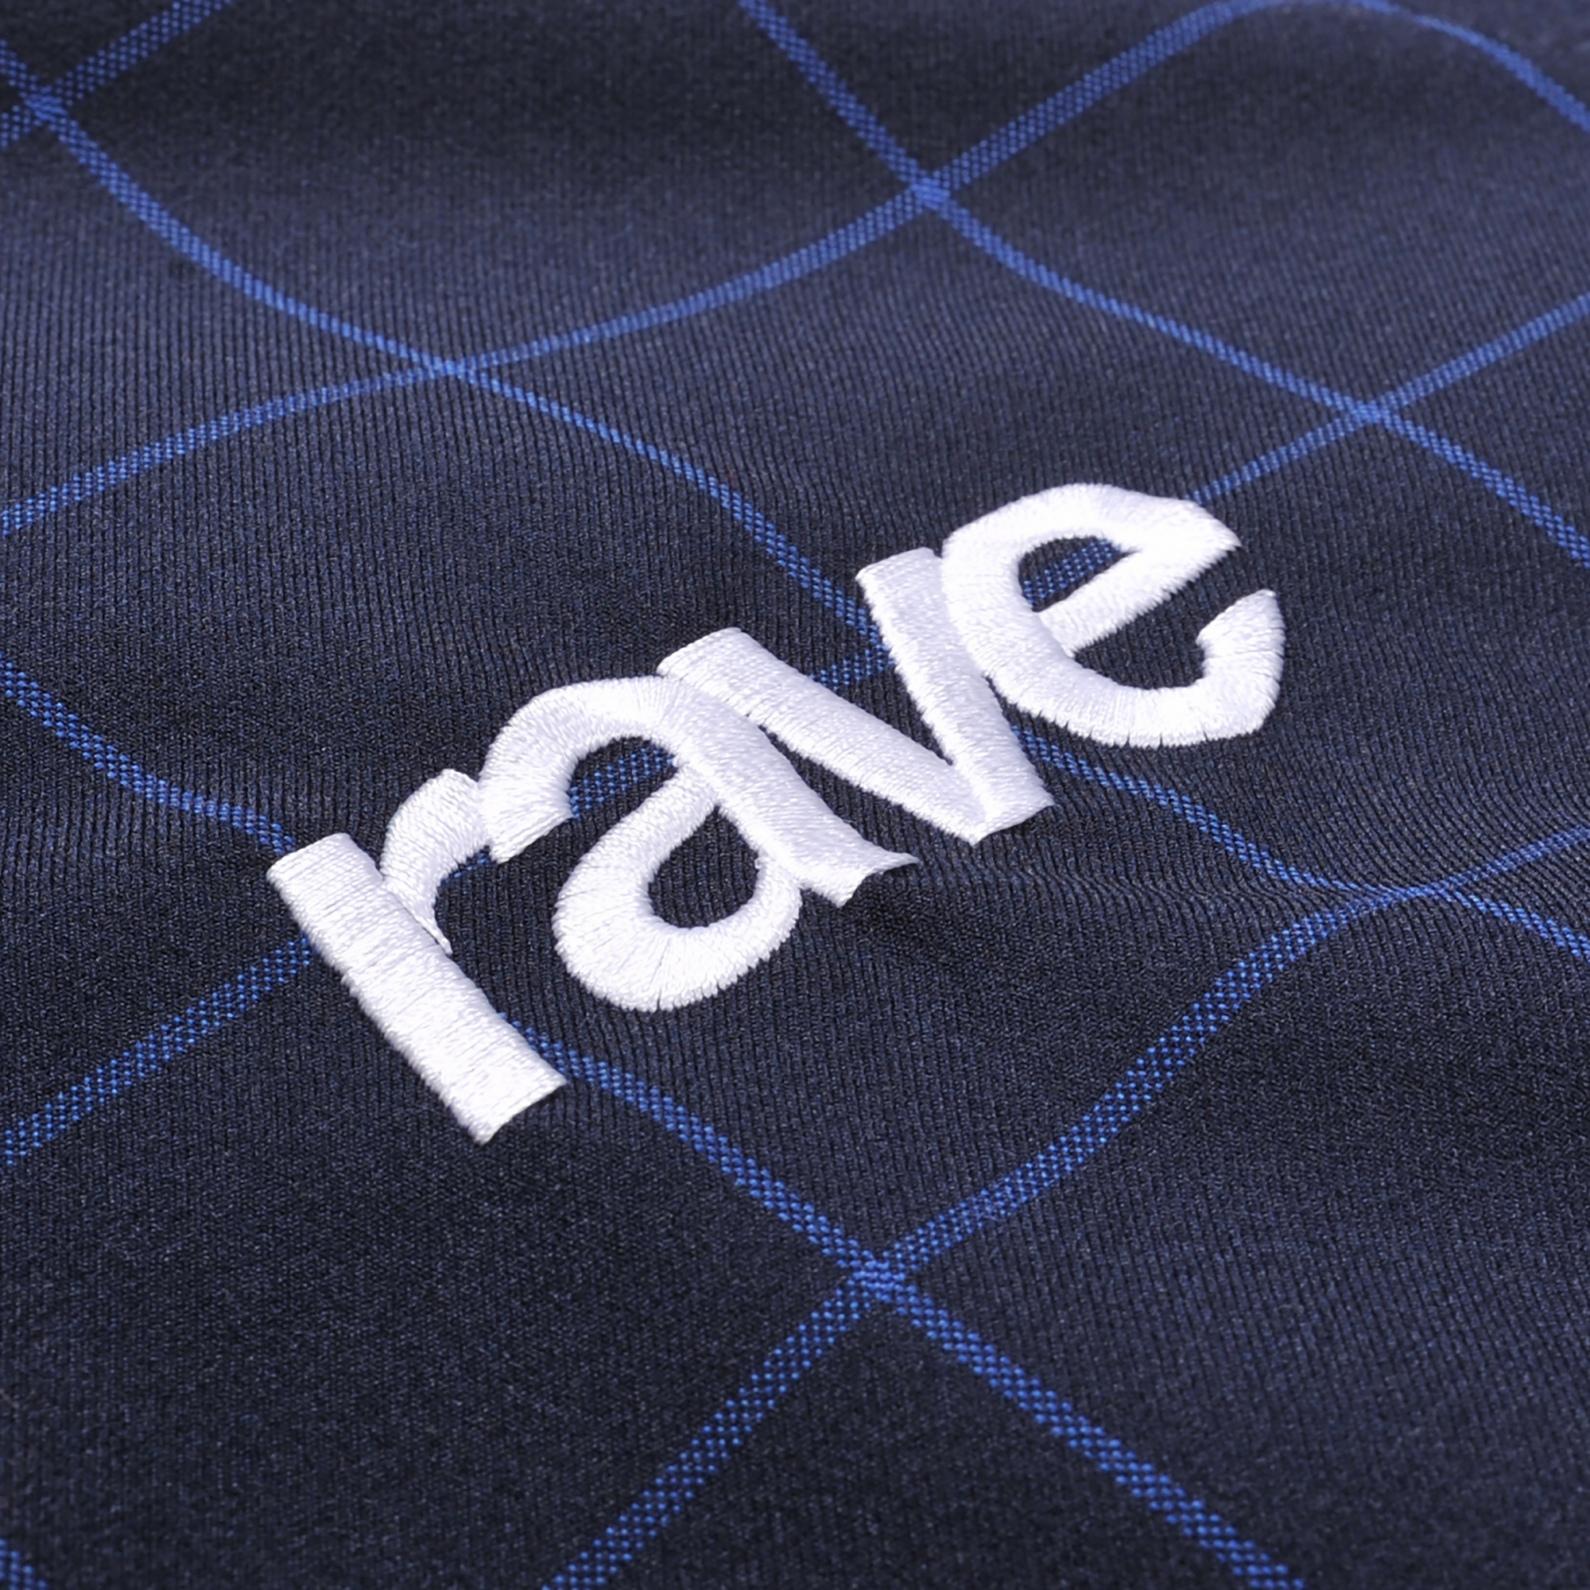 【RAVE SKATEBOARDS/レイブスケートボード】SPIKE CORDUROY REVERSIBLE  コーデュロイリバーシブルジャケット / NAVY